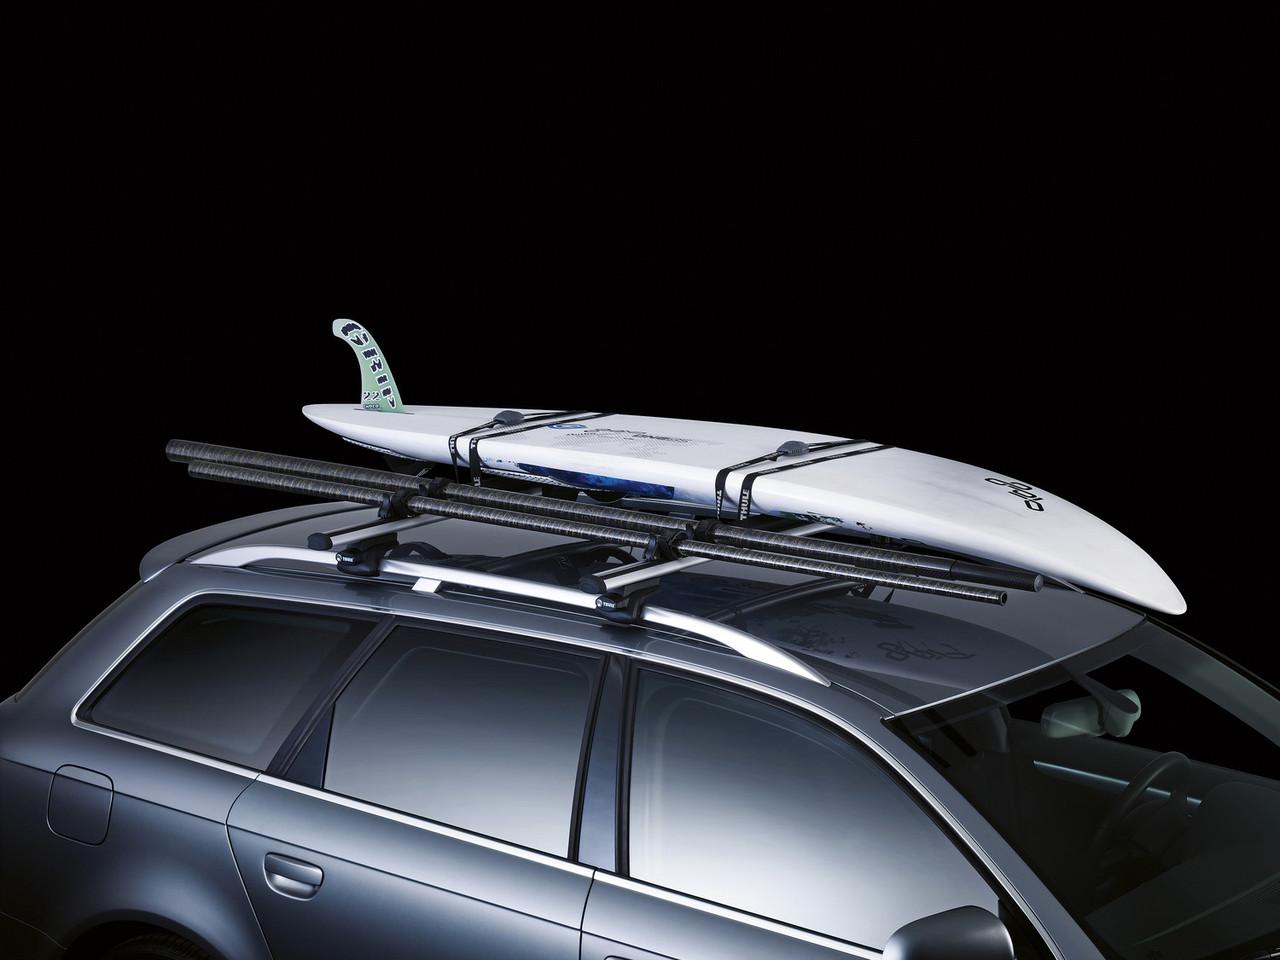 Крепление для виндсерфинга Thule Windsurfing Carrier 833 - Motion Store в Днепре